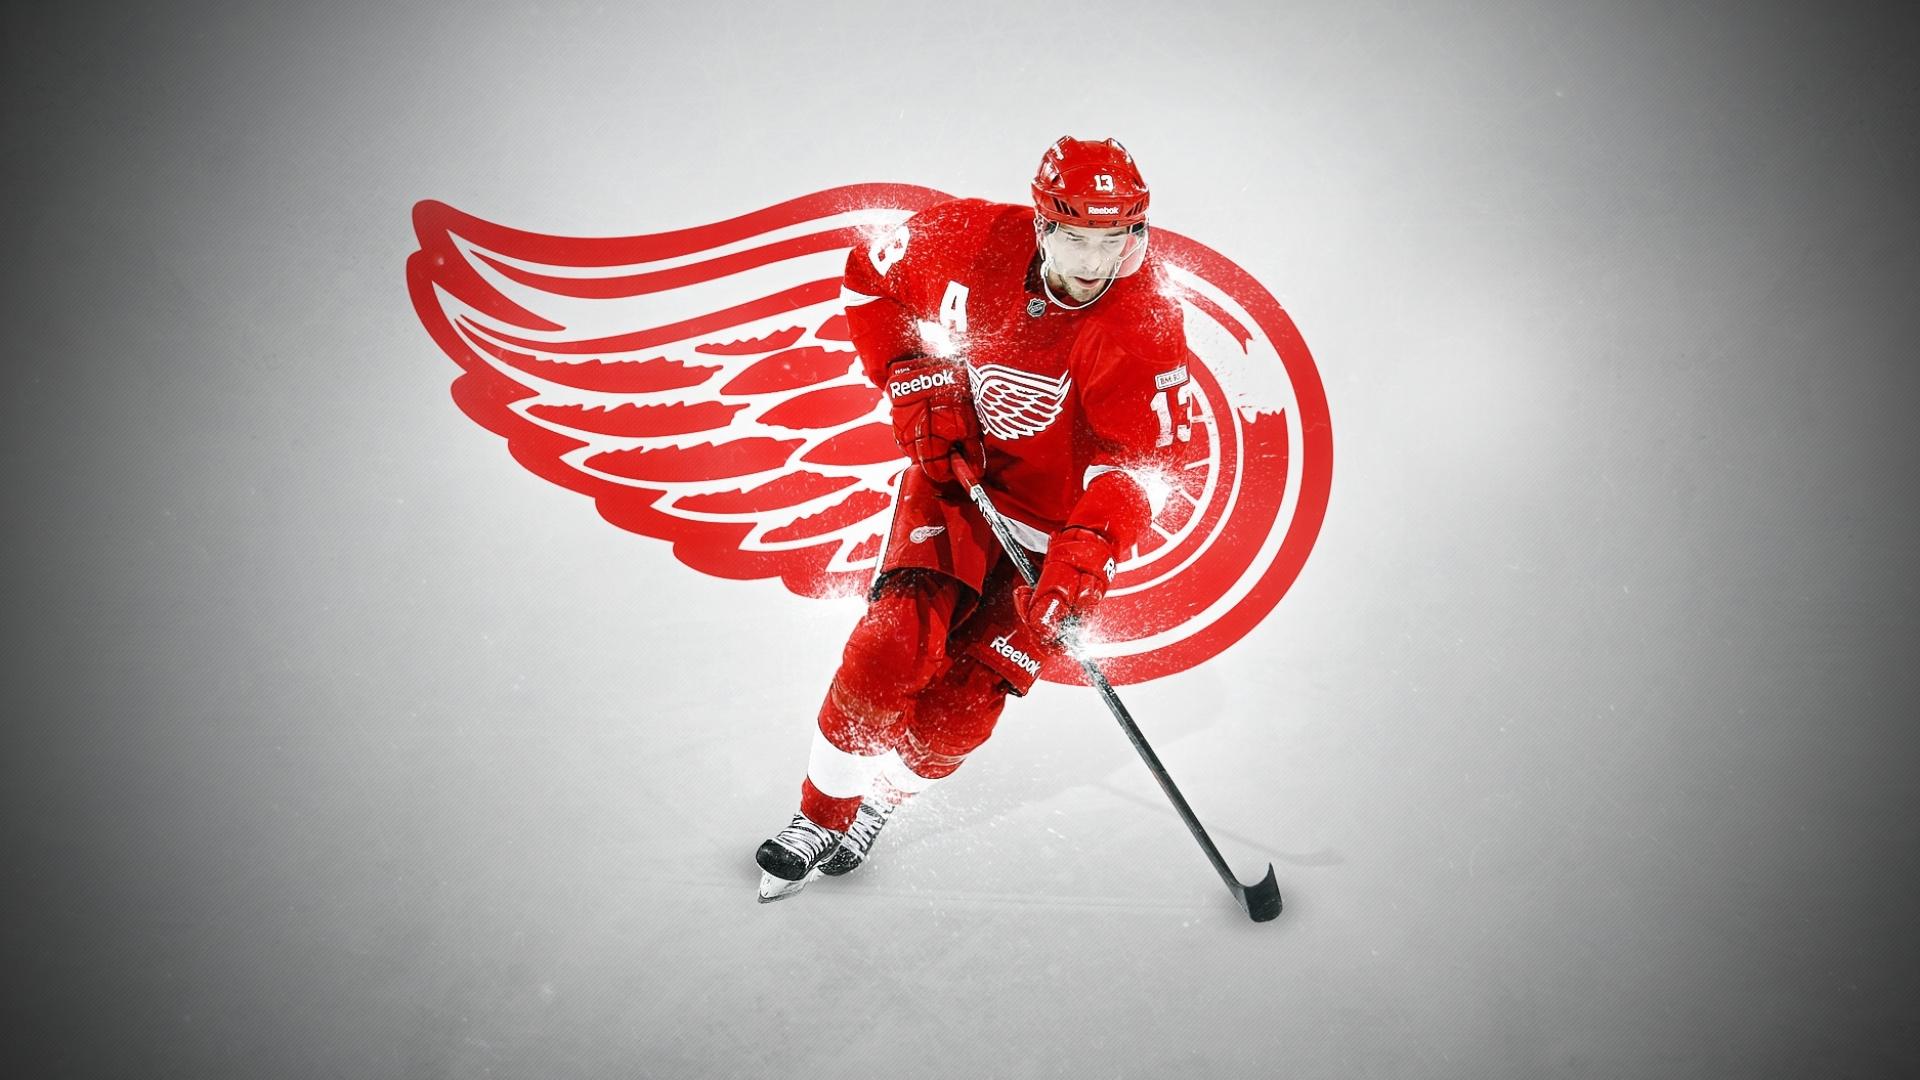 Hockey nhl dat detroit red wings pavel datsyuk wallpaper 1920x1080 1920x1080